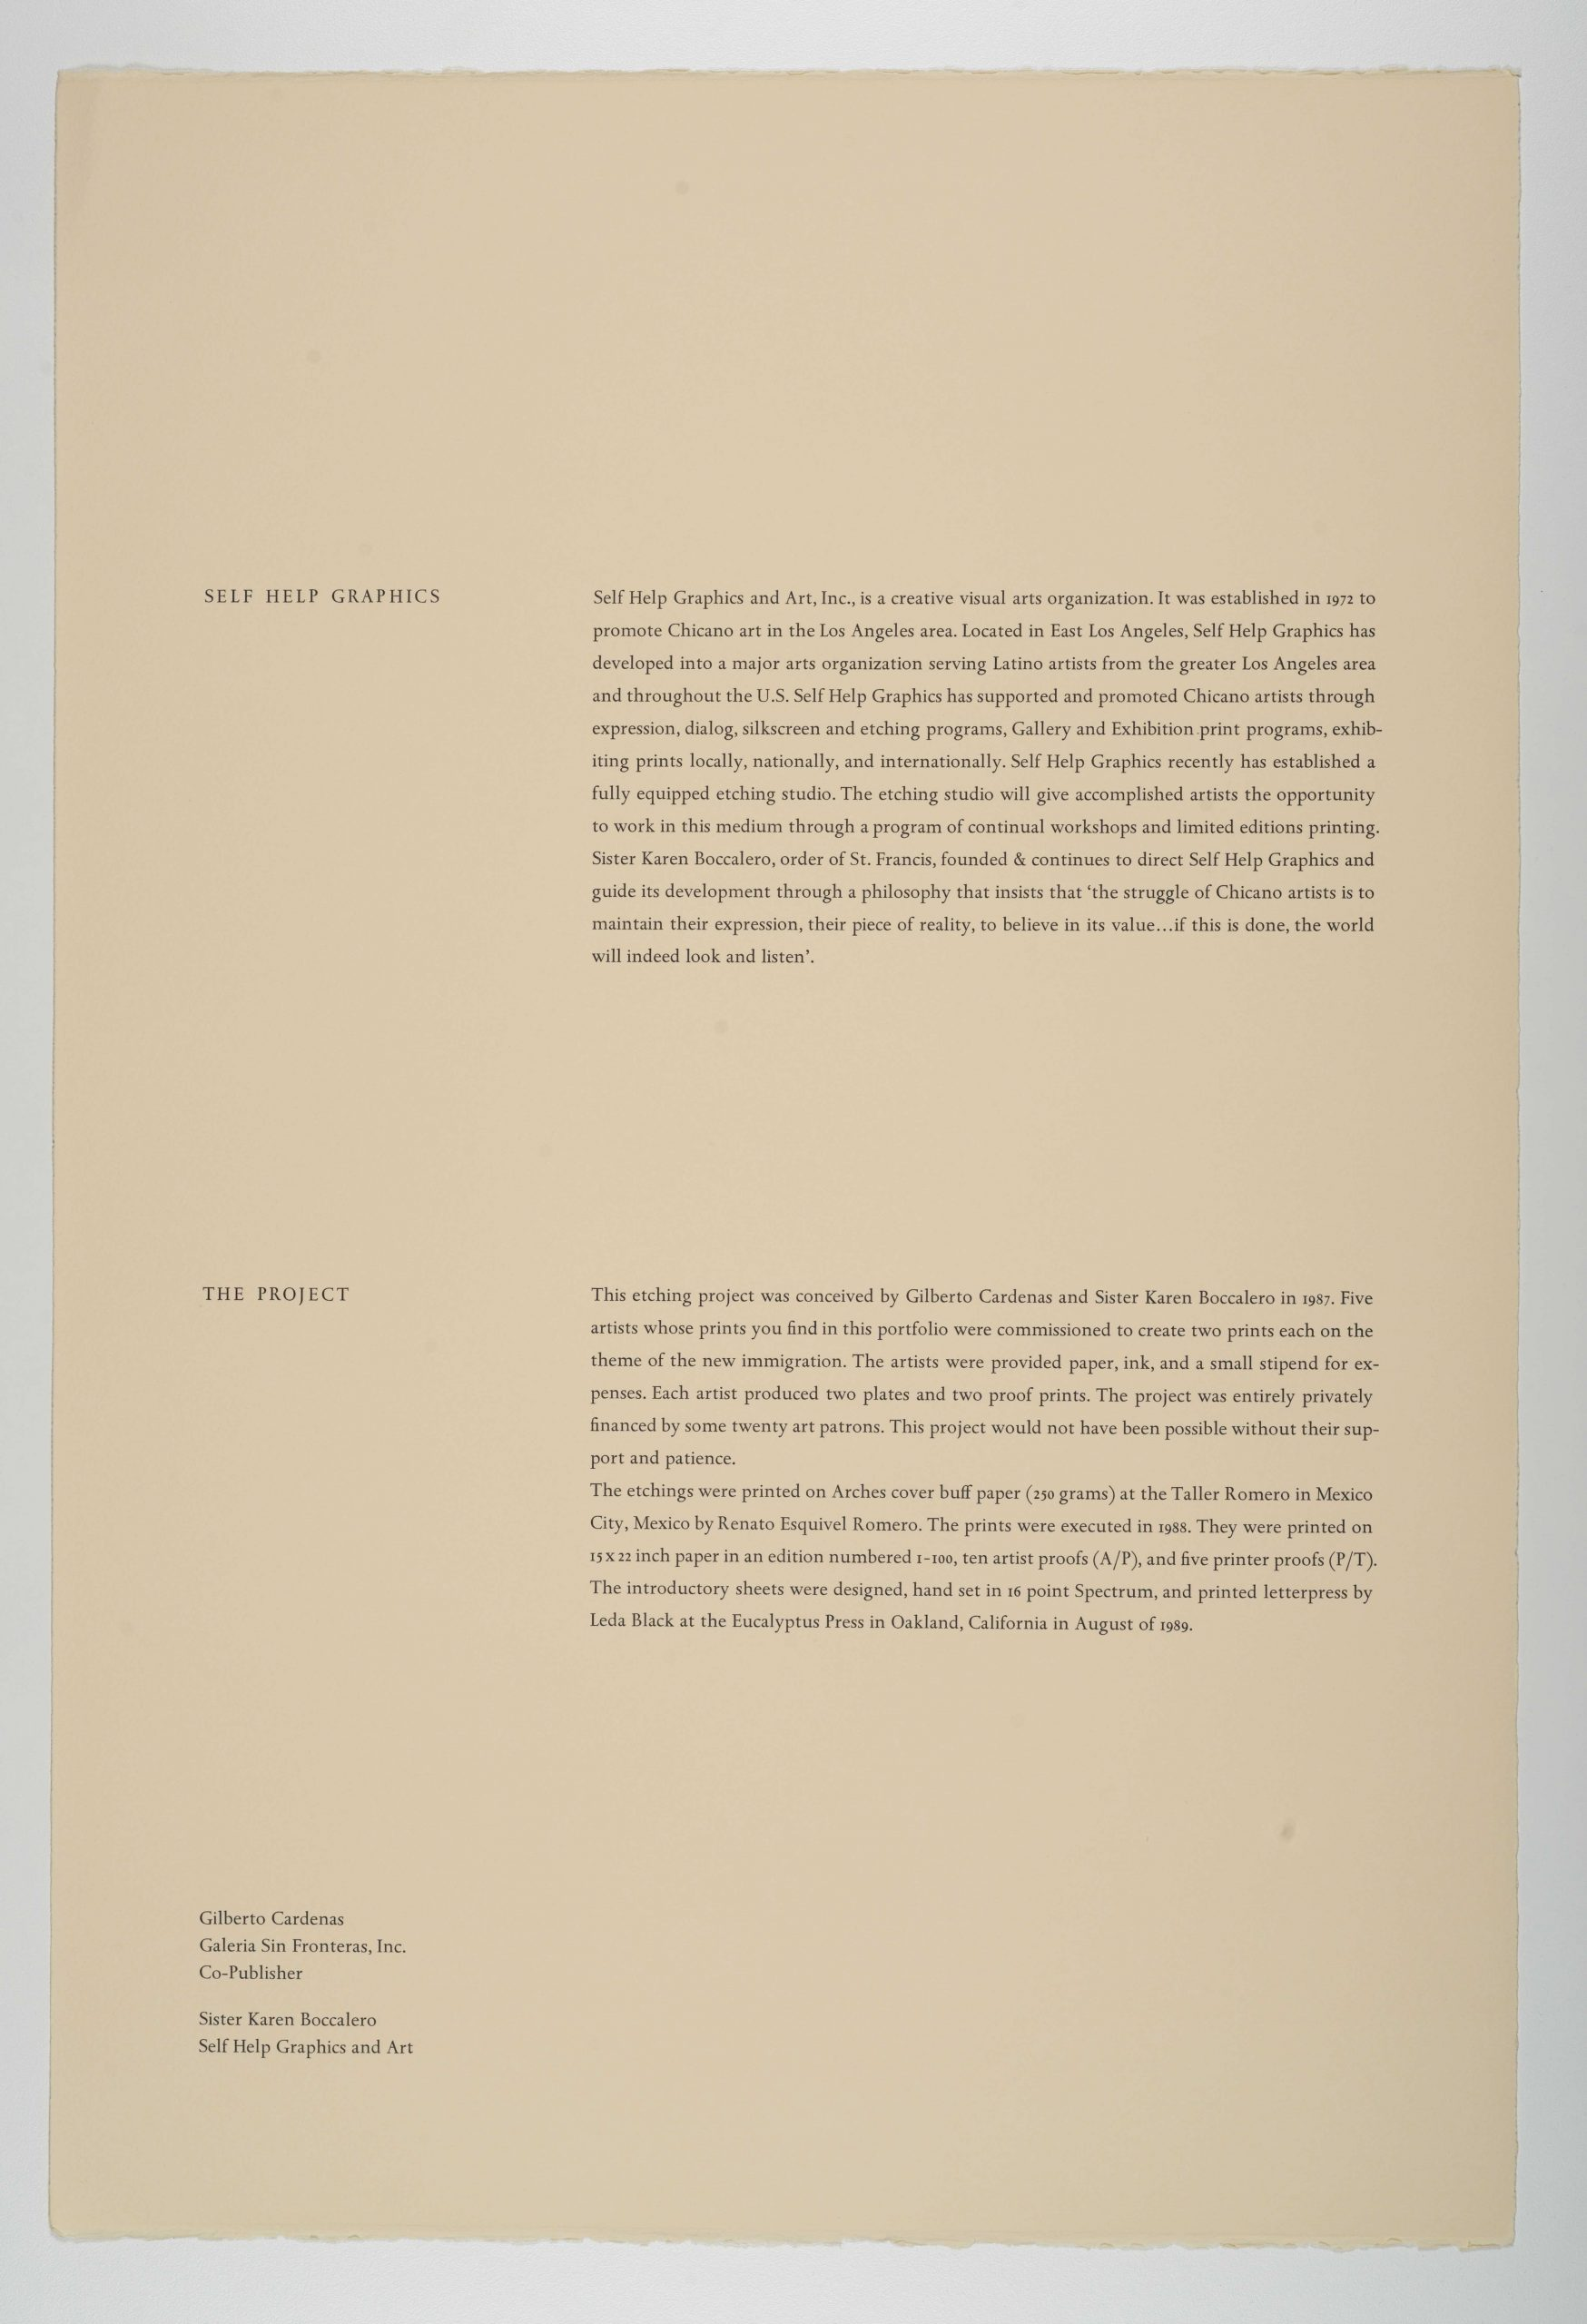 Self Help Graphics description, The New Immigration series, 1988